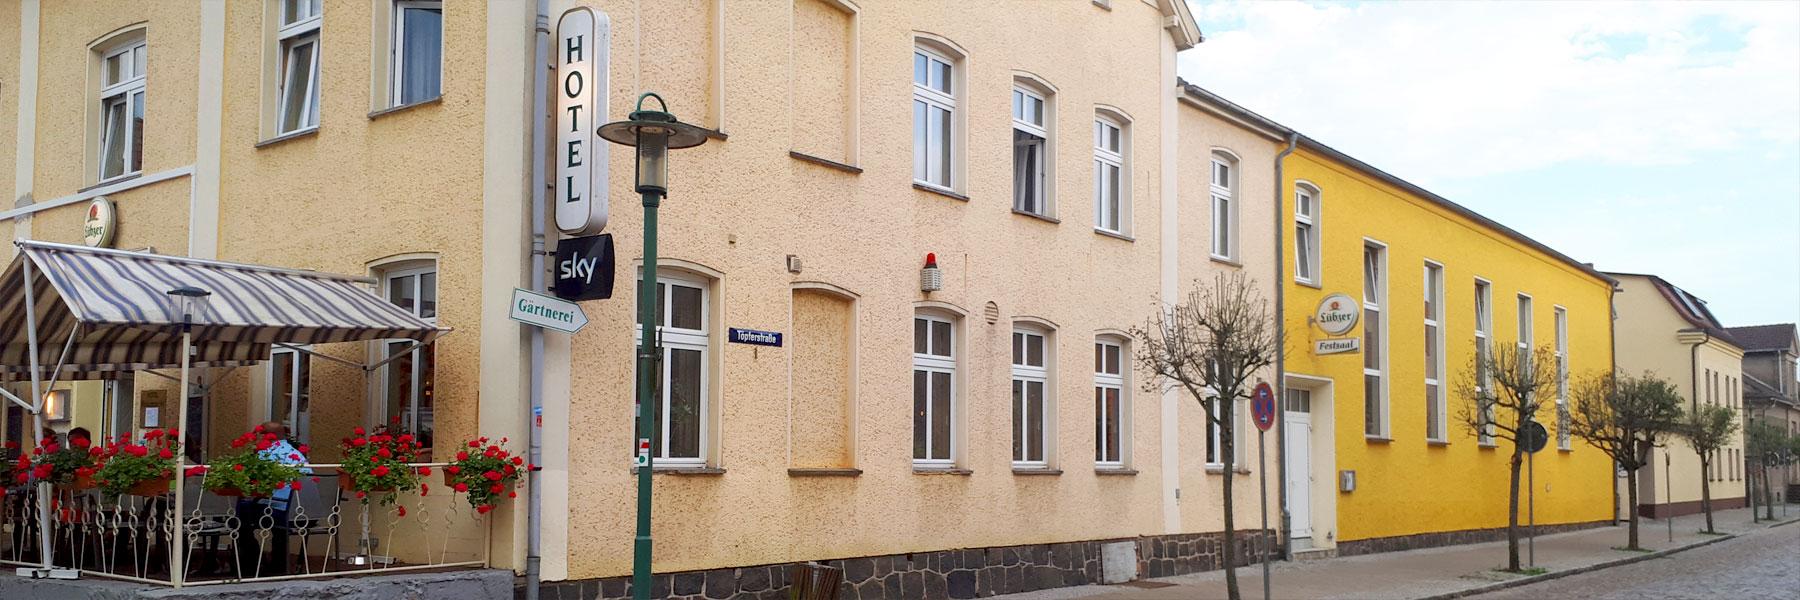 Festsaal - Mecklenburger Hof